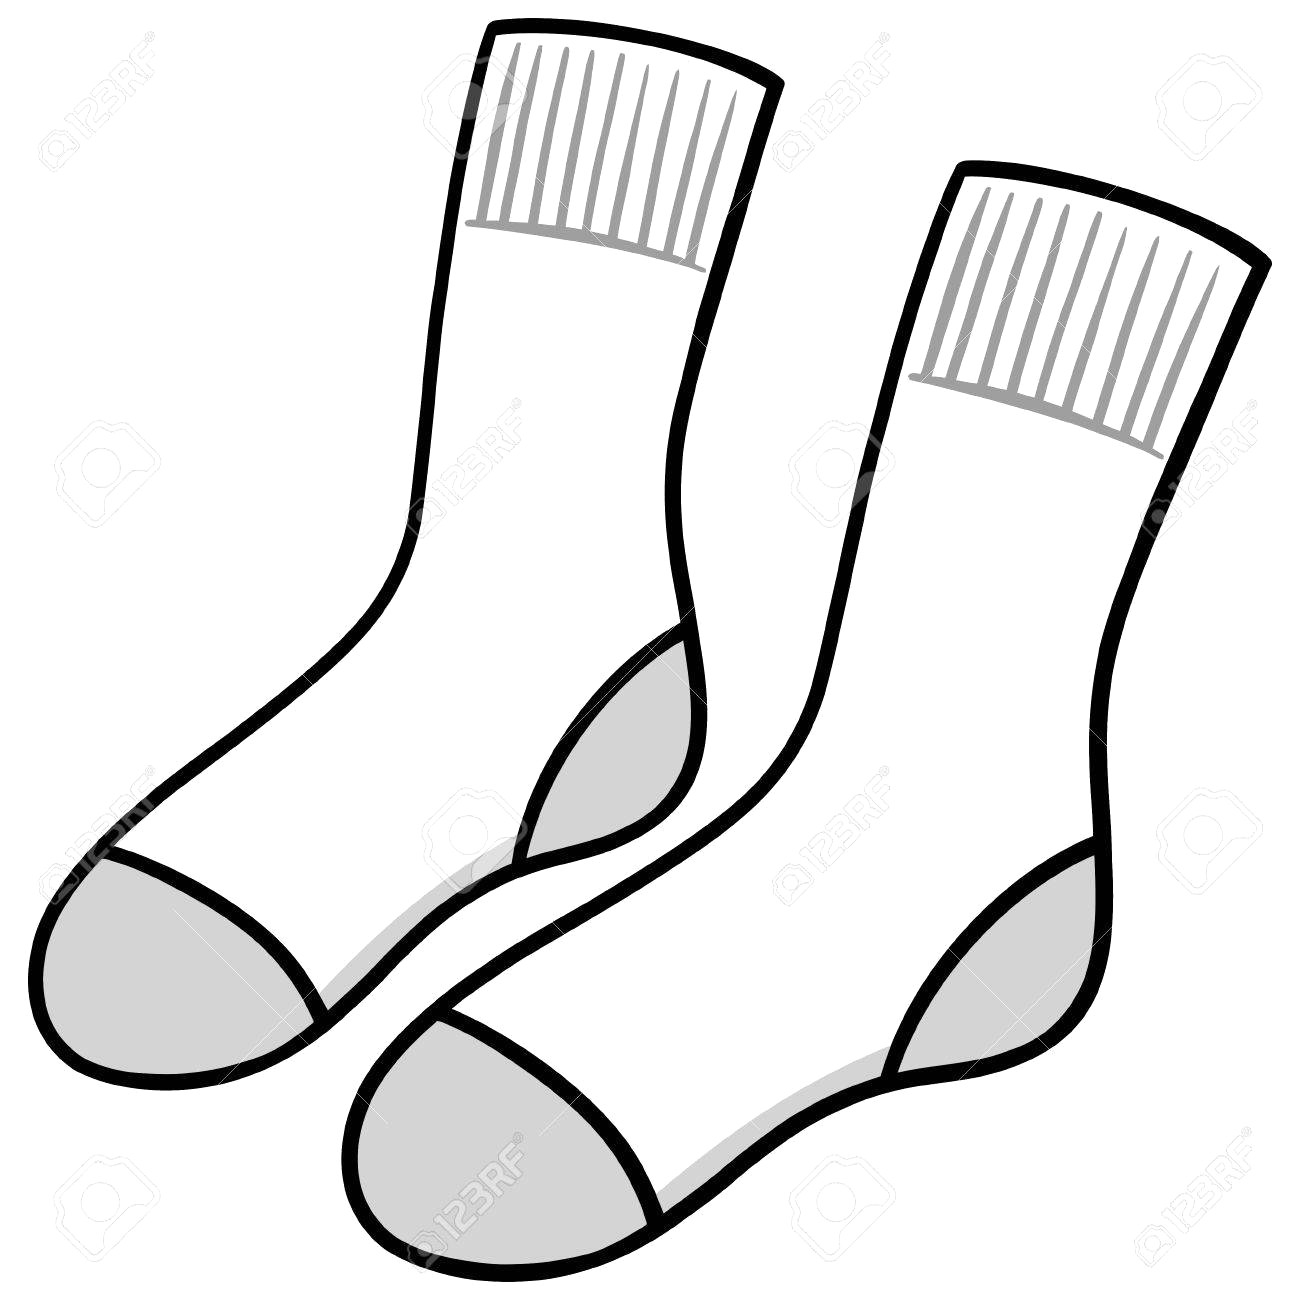 Clipart socks » Clipart Station.